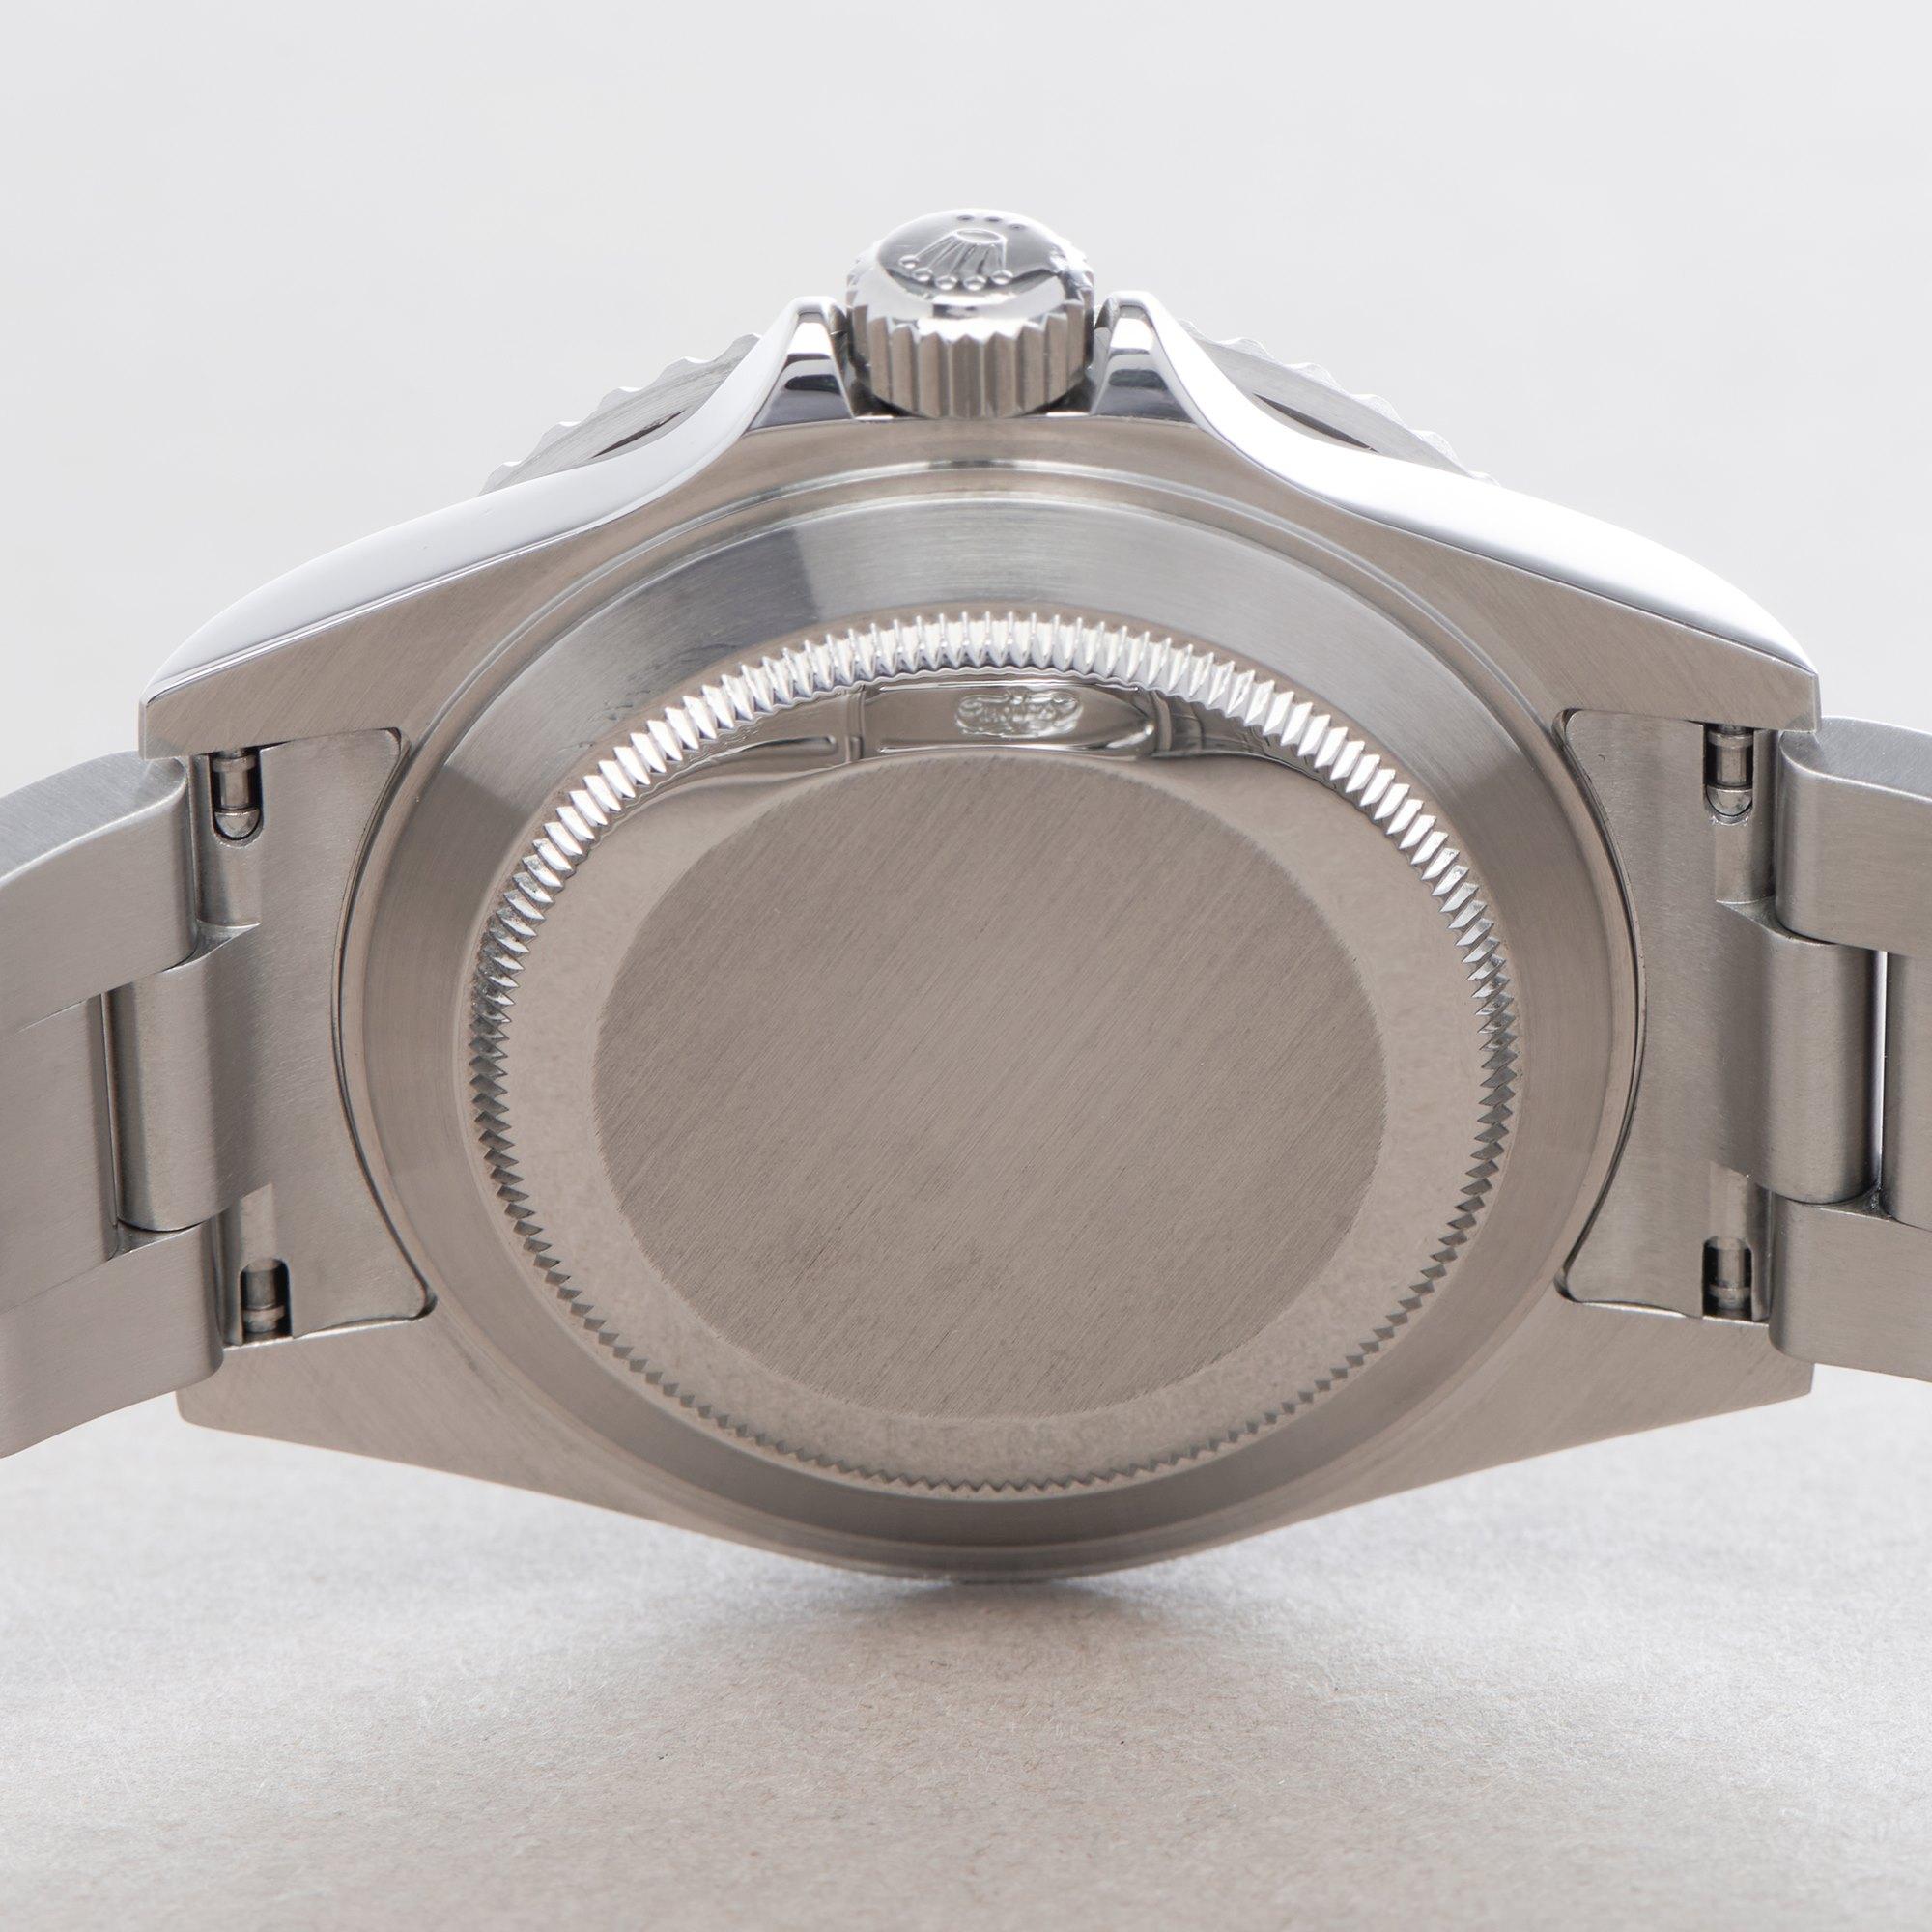 Rolex Submariner Kermit, Engraved Rehaut Stainless Steel 16610LV